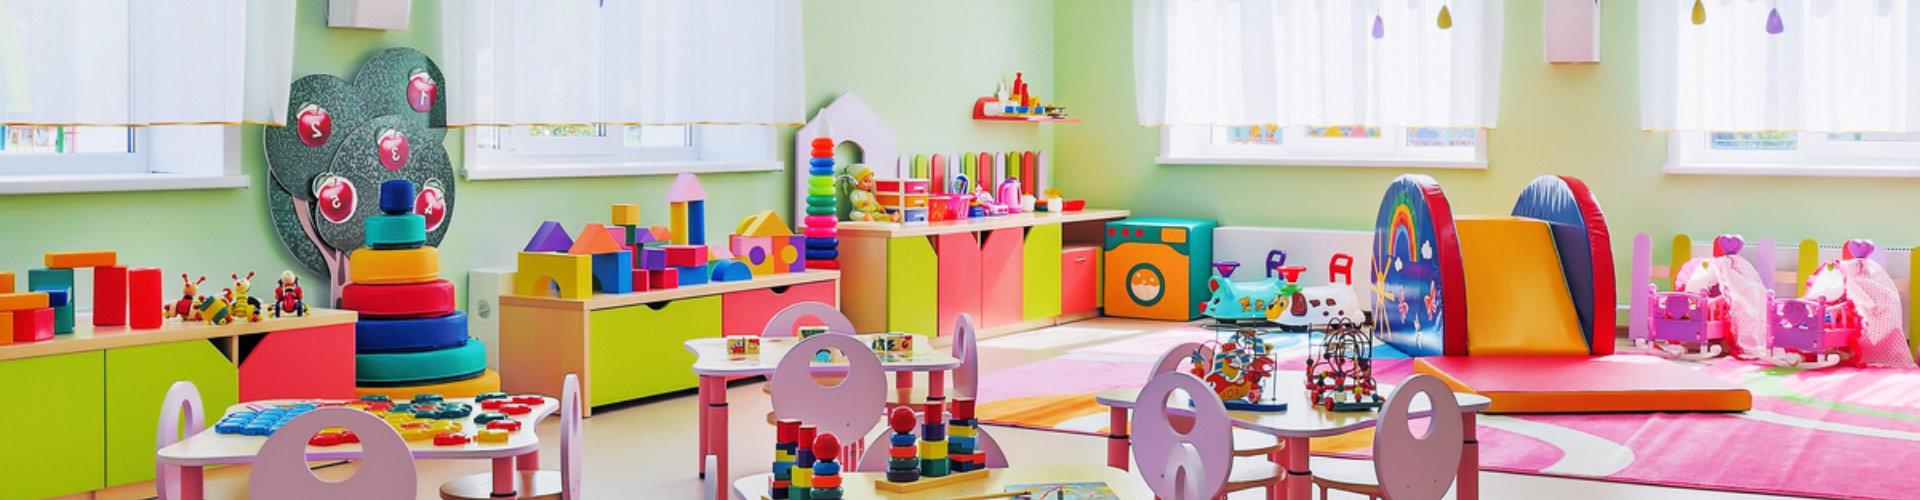 child care classroom